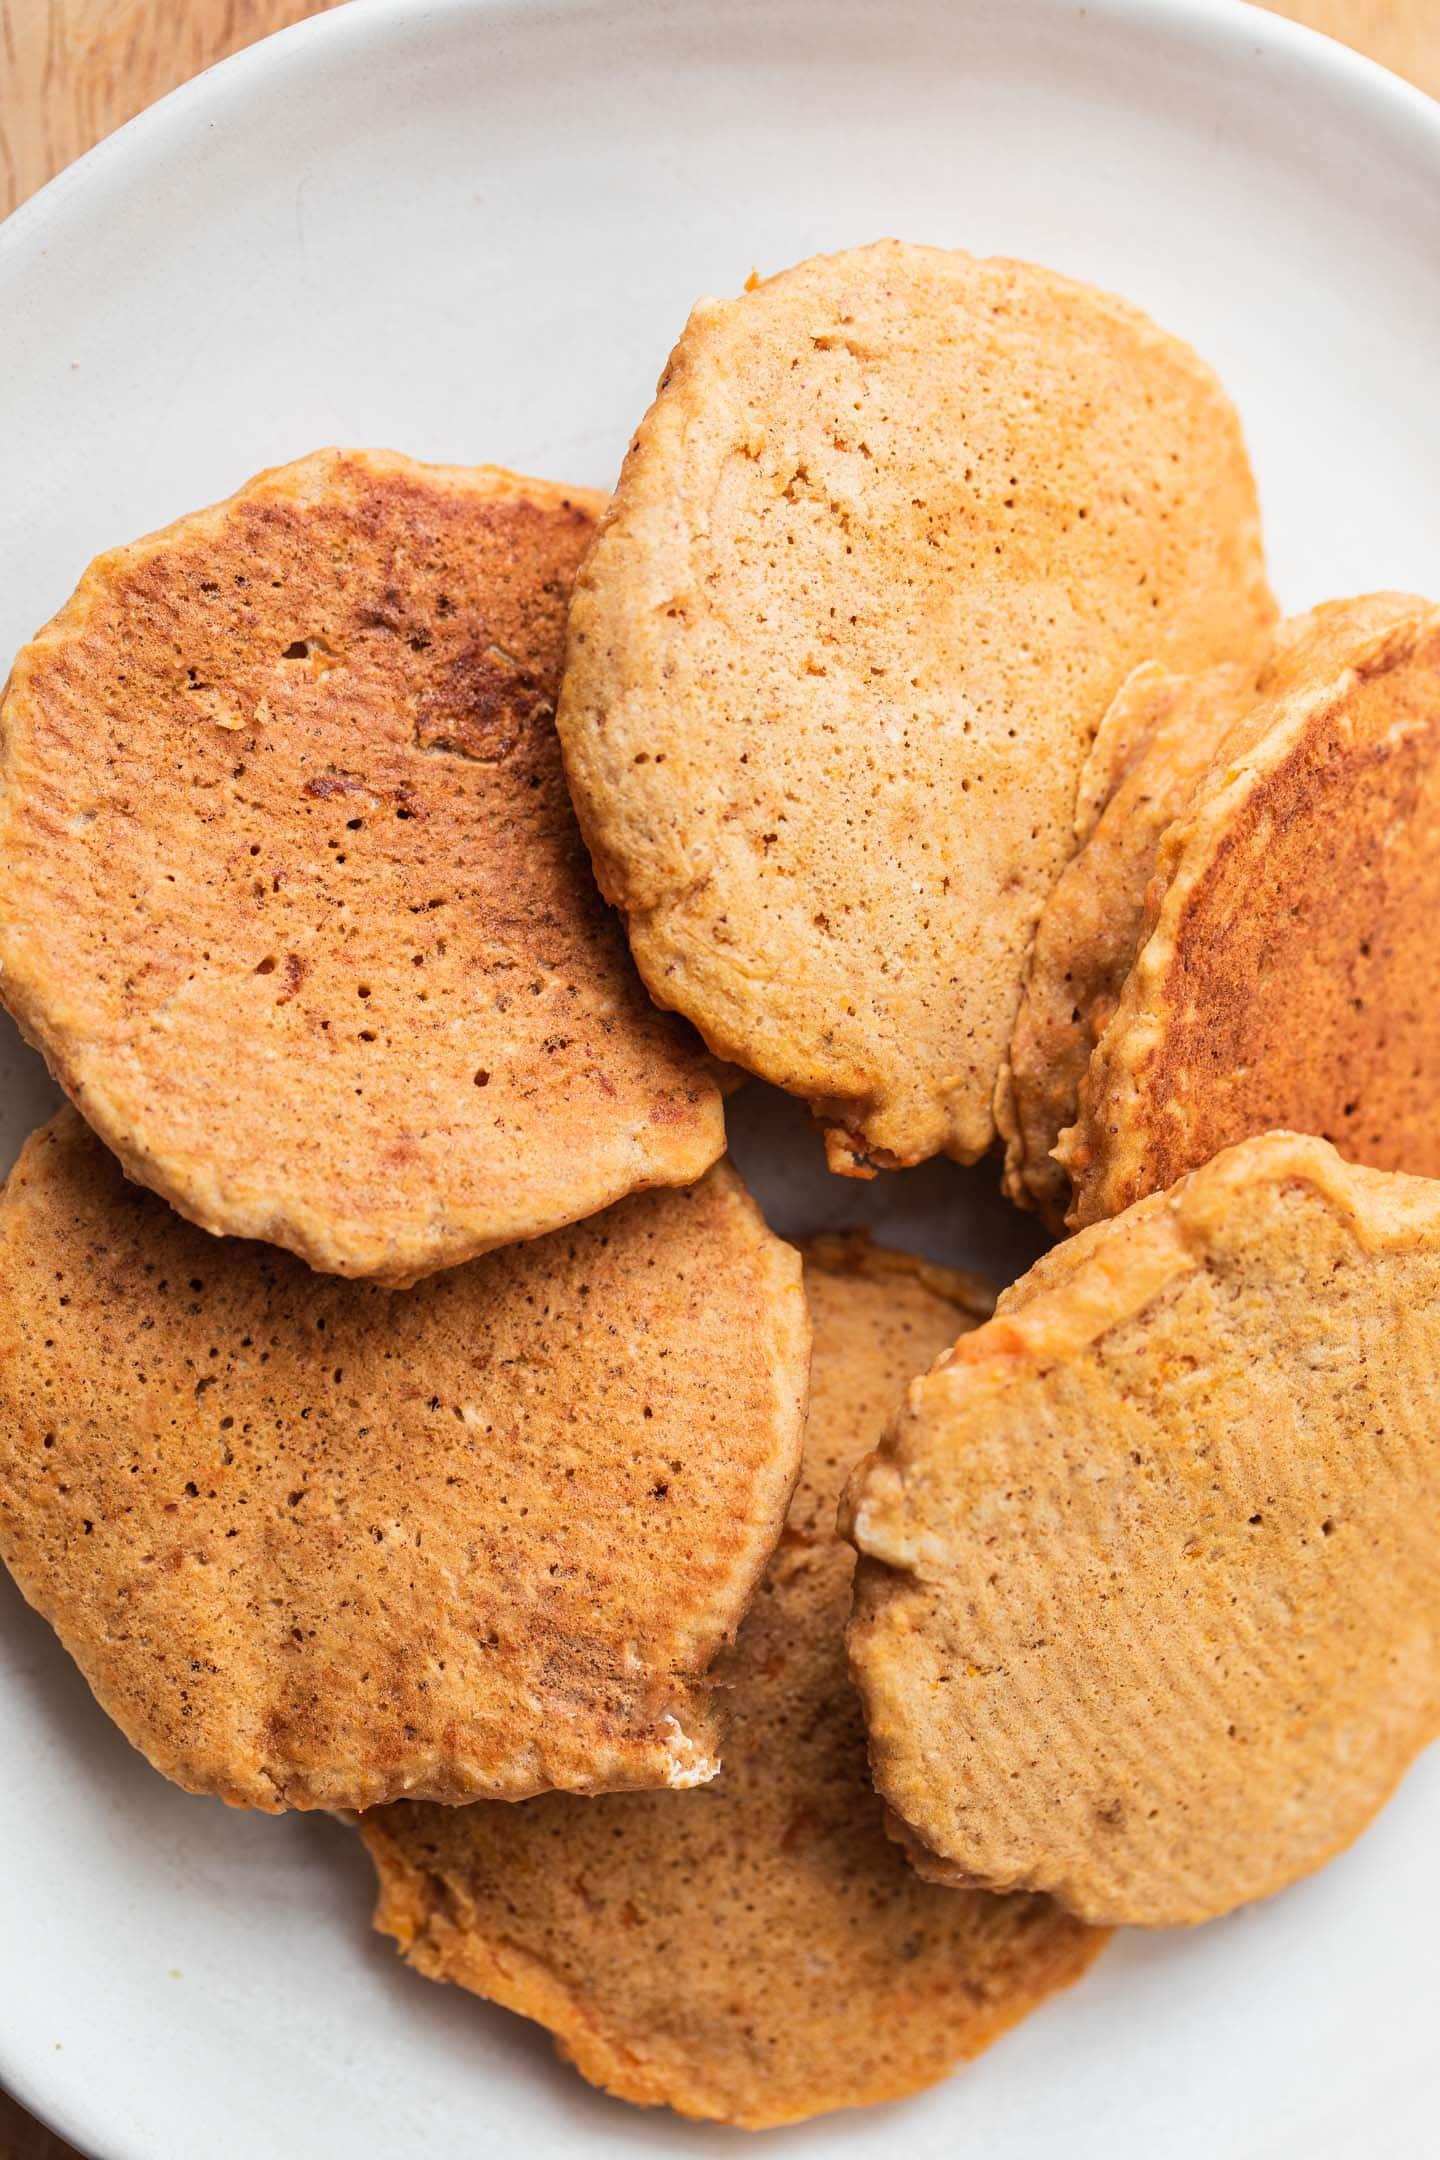 Plain pumpkin pancakes on a plate